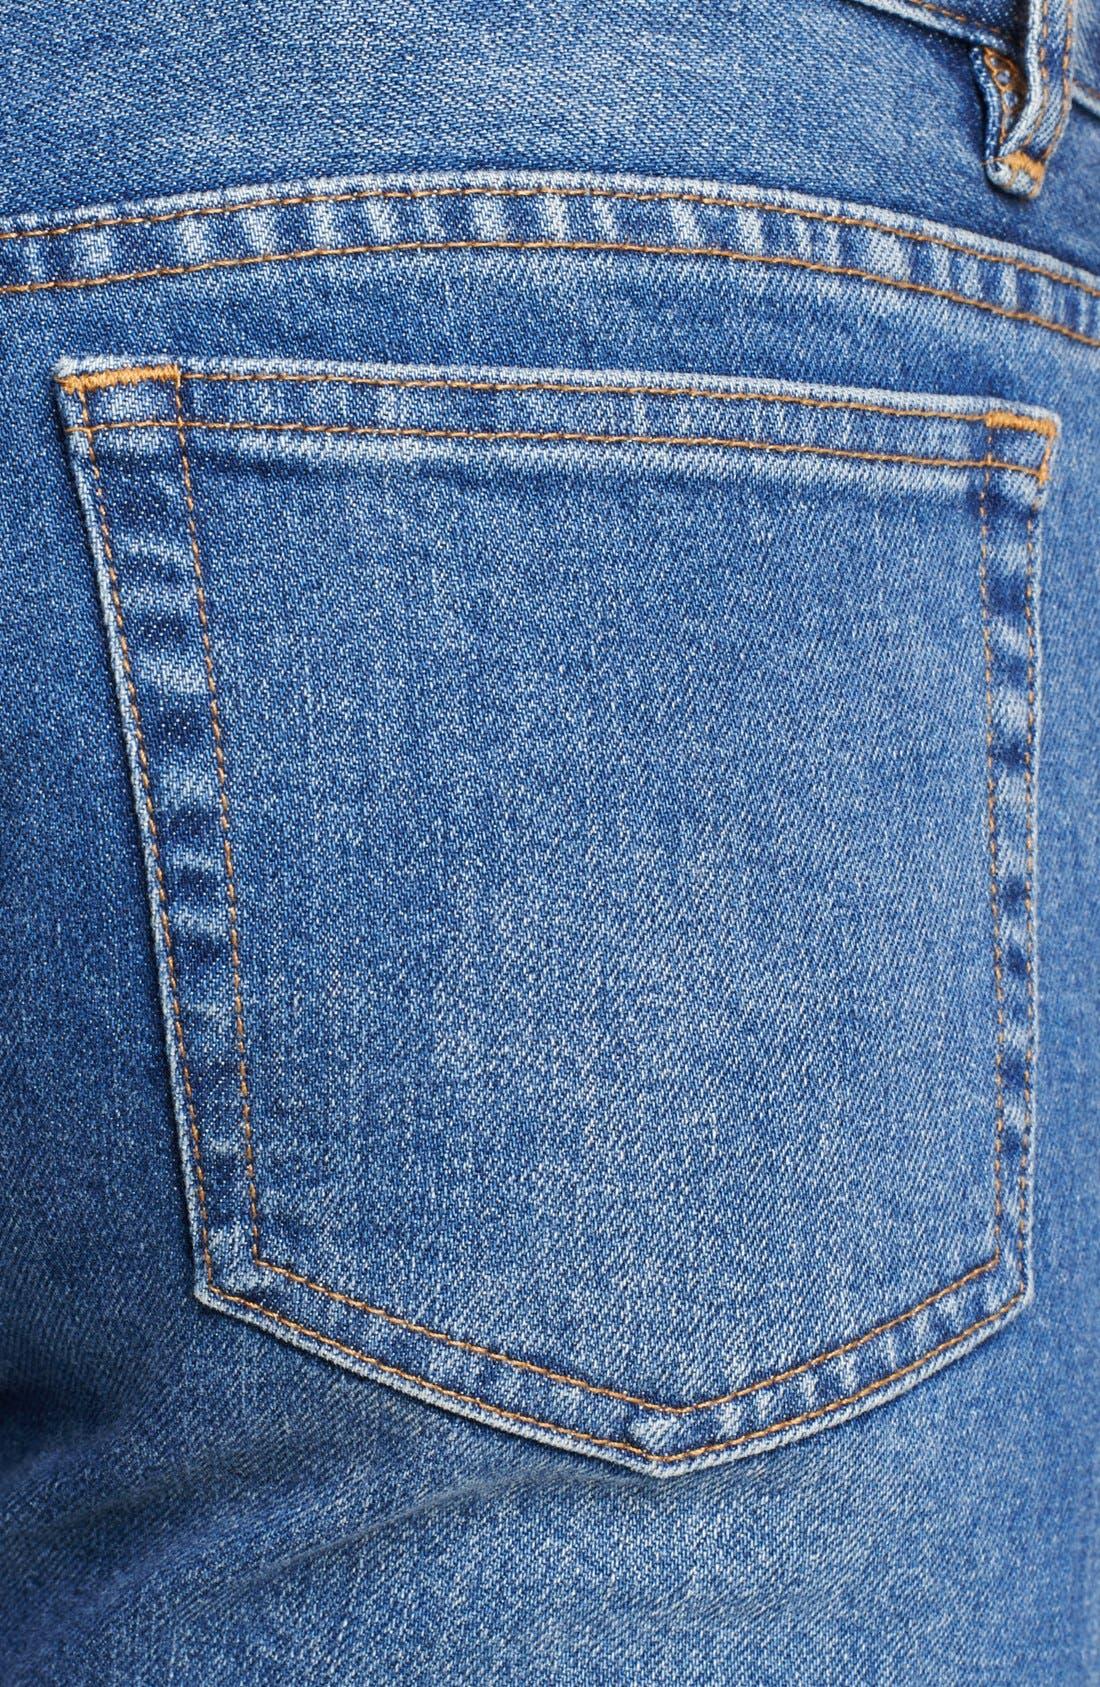 Alternate Image 3  - A.P.C. 'Petit New Standard' Skinny Fit Jeans (Denim Blue)